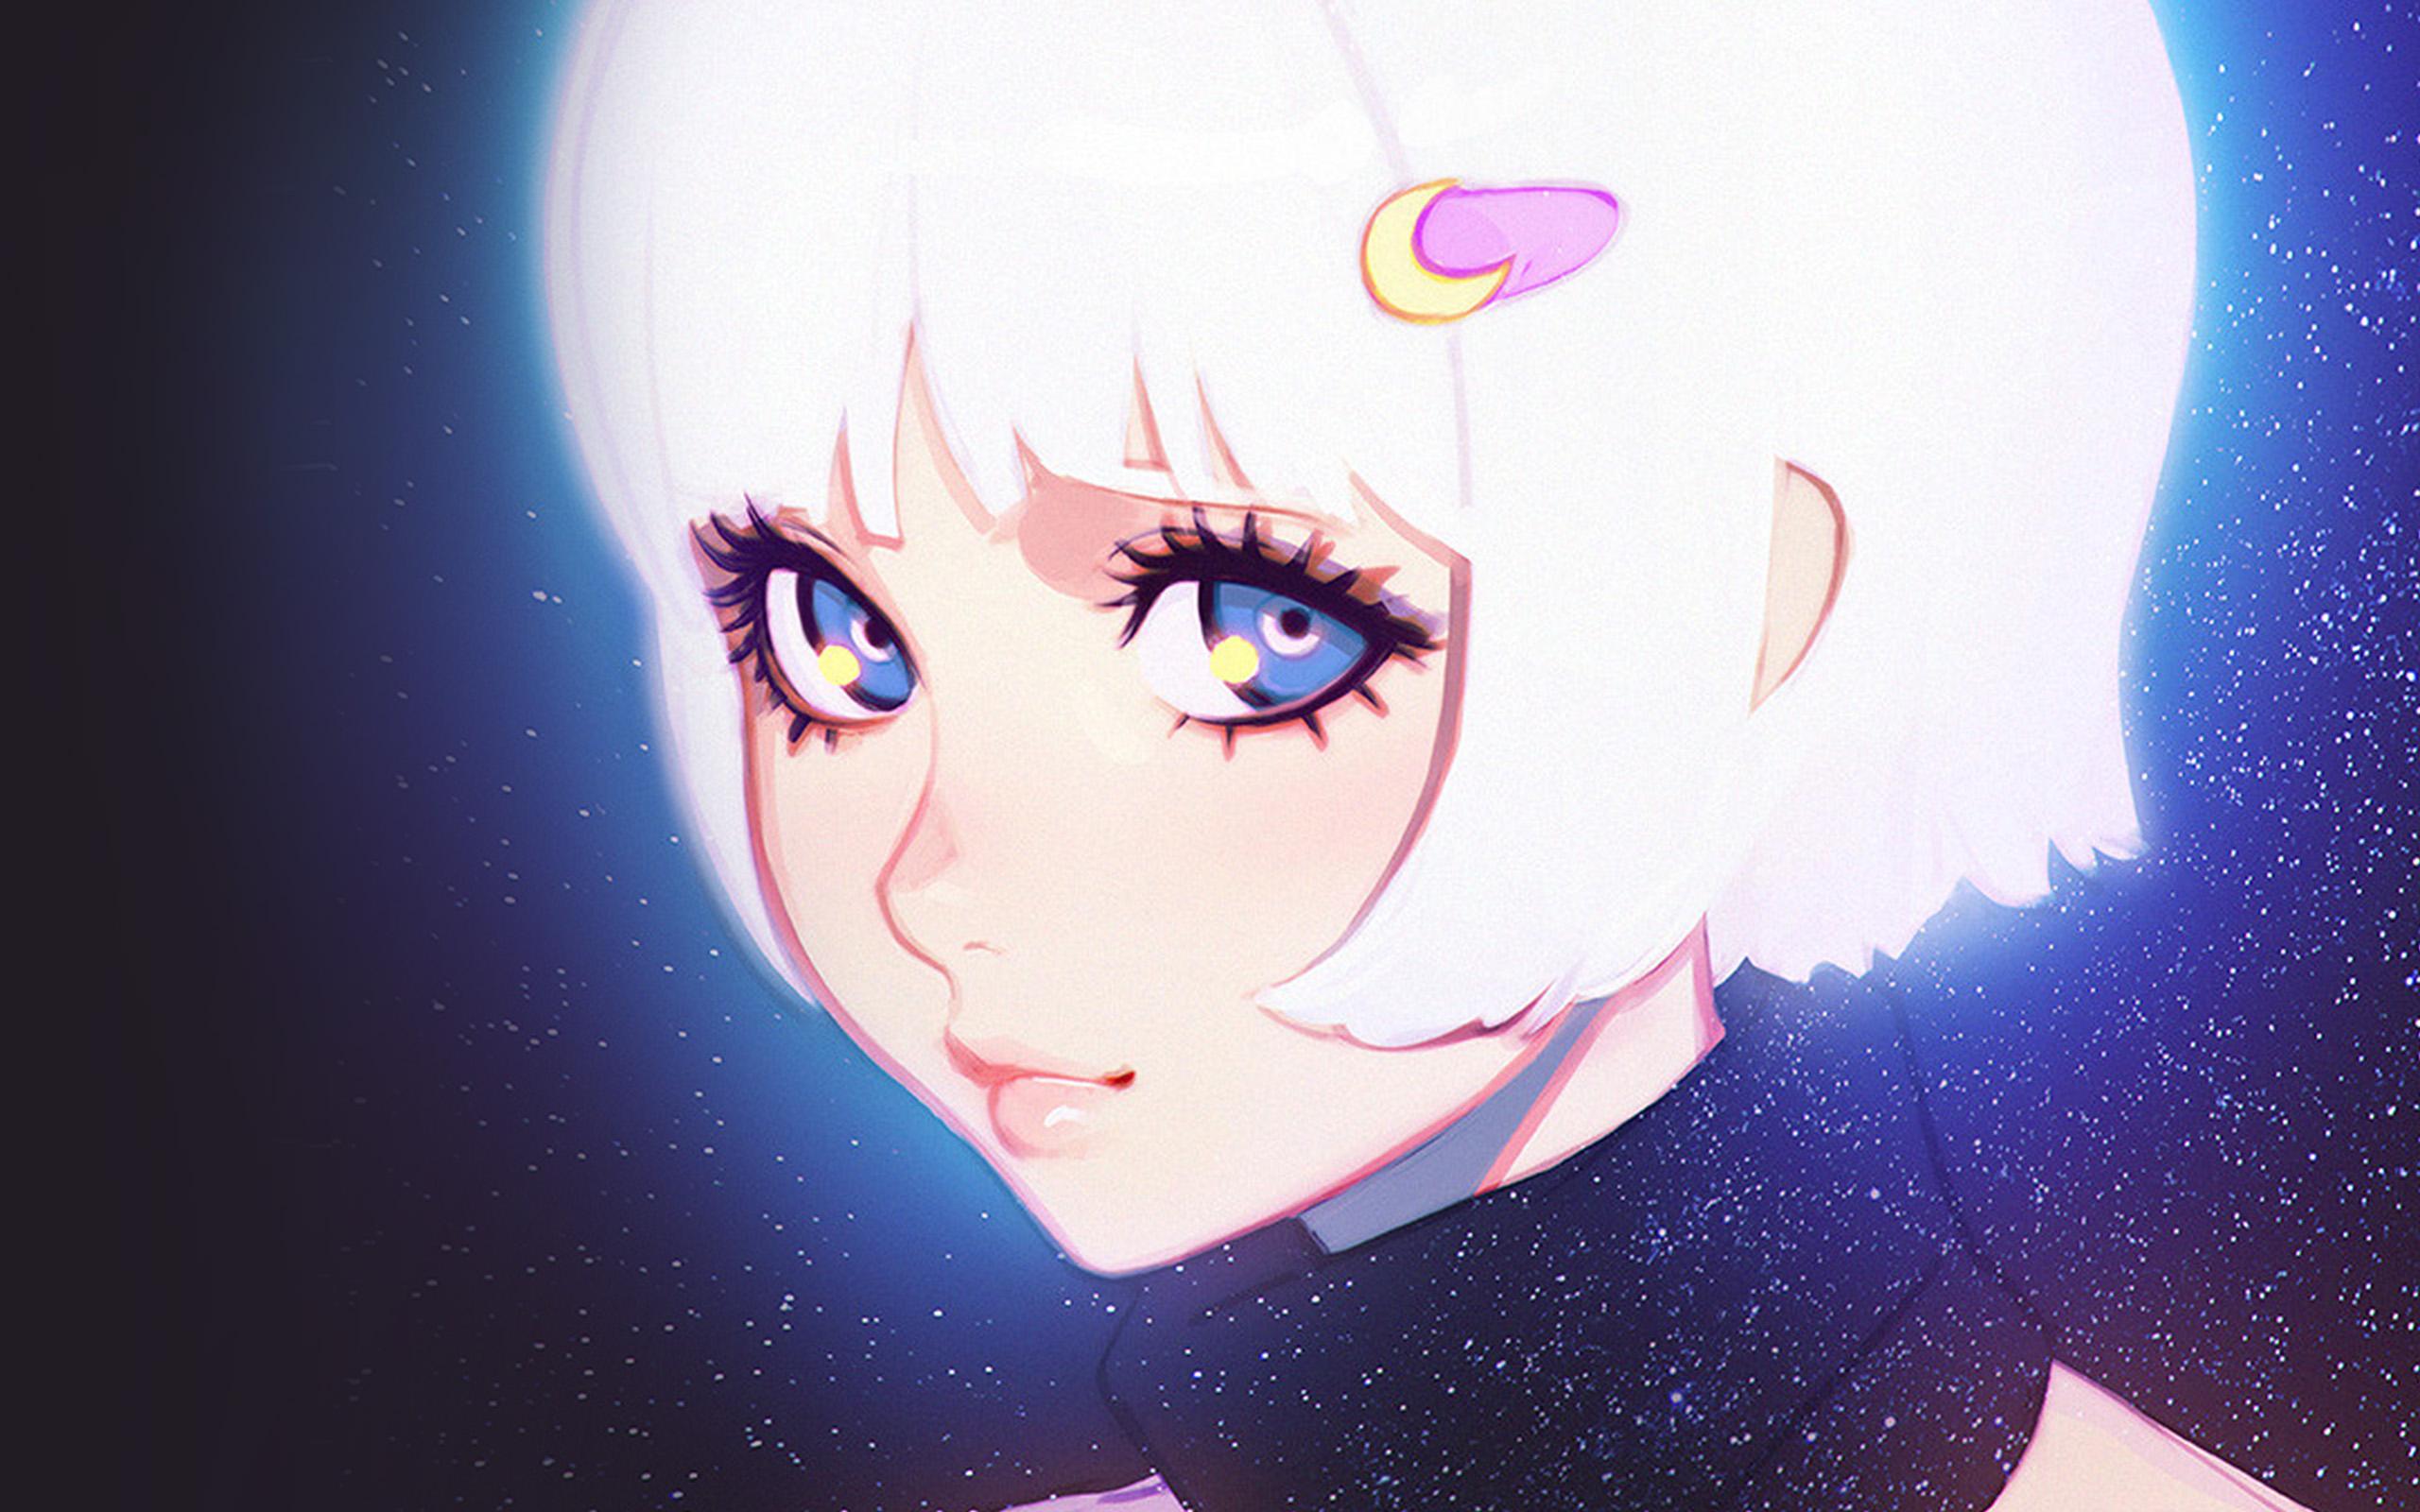 D Va Cute Wallpaper Ax54 Ilya Kuvshinov Illustration Art Girl Dark White Hair